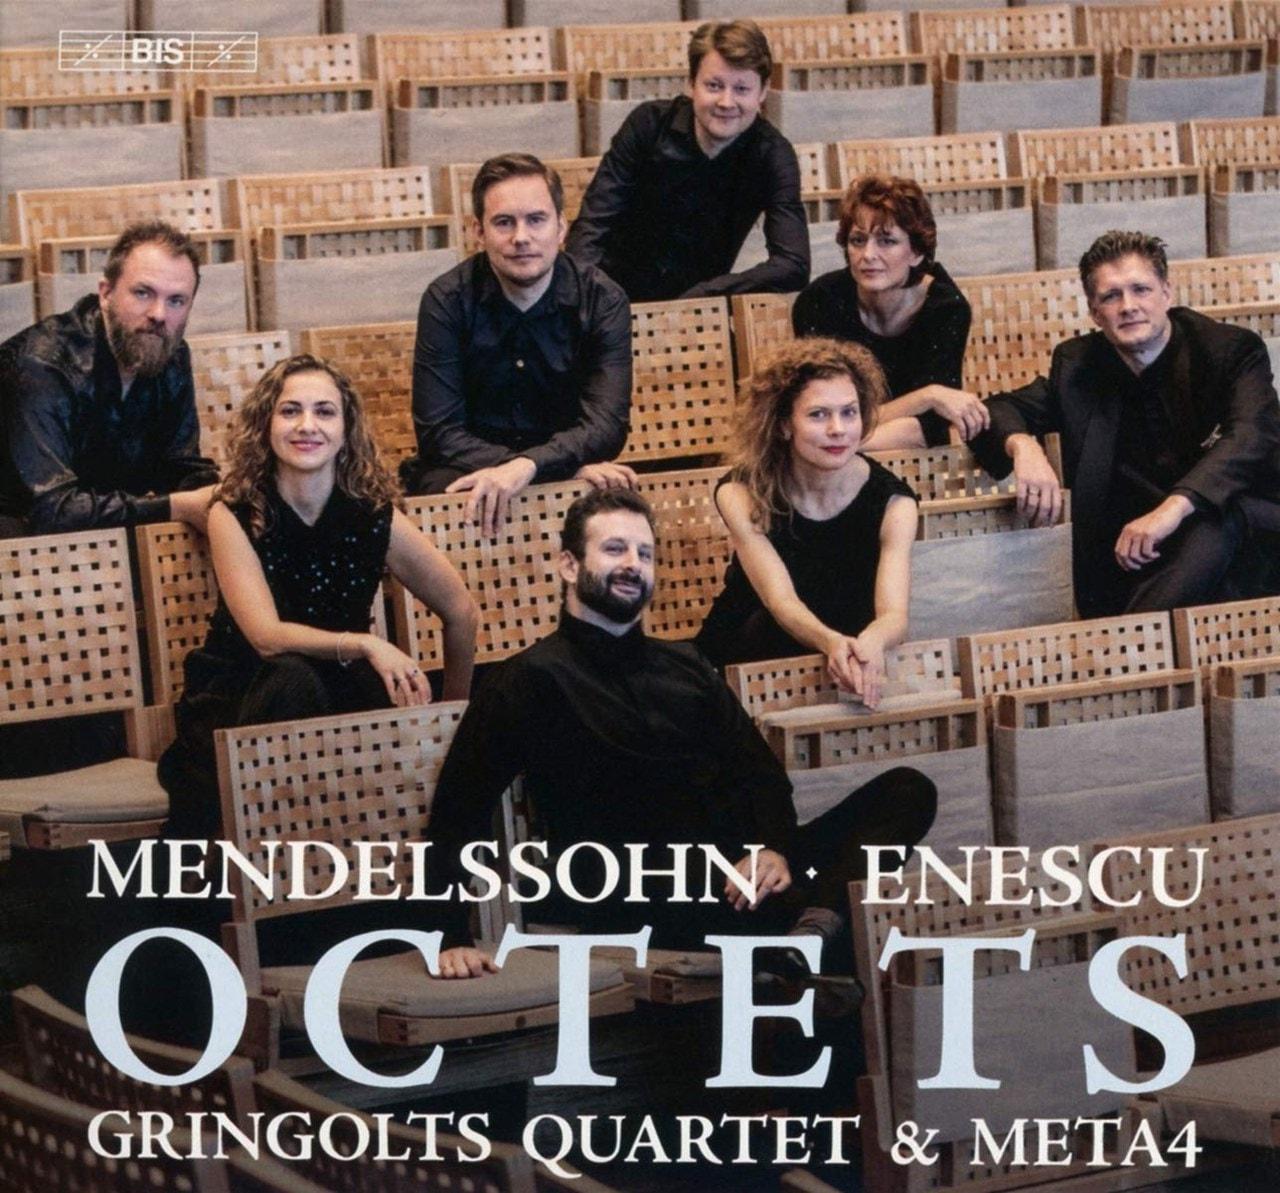 Mendelssohn/Enescu: Octets - 1